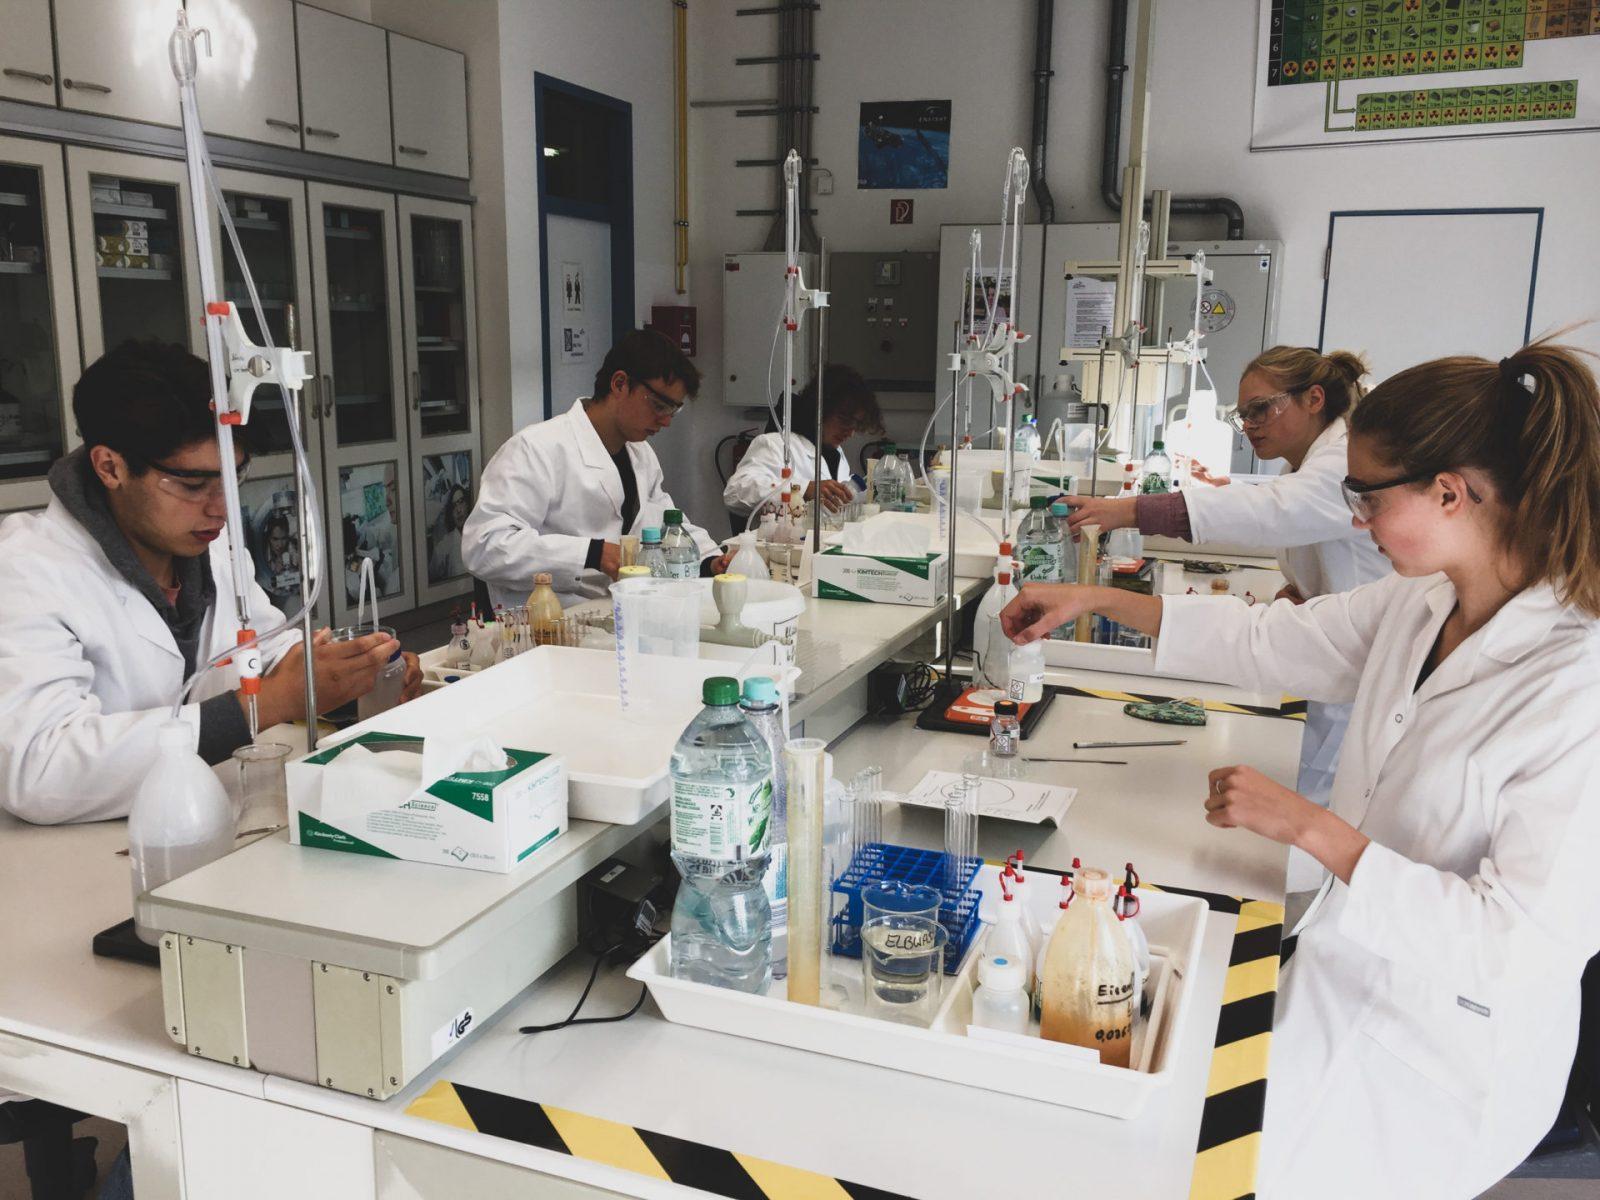 Chemie-Exkursion